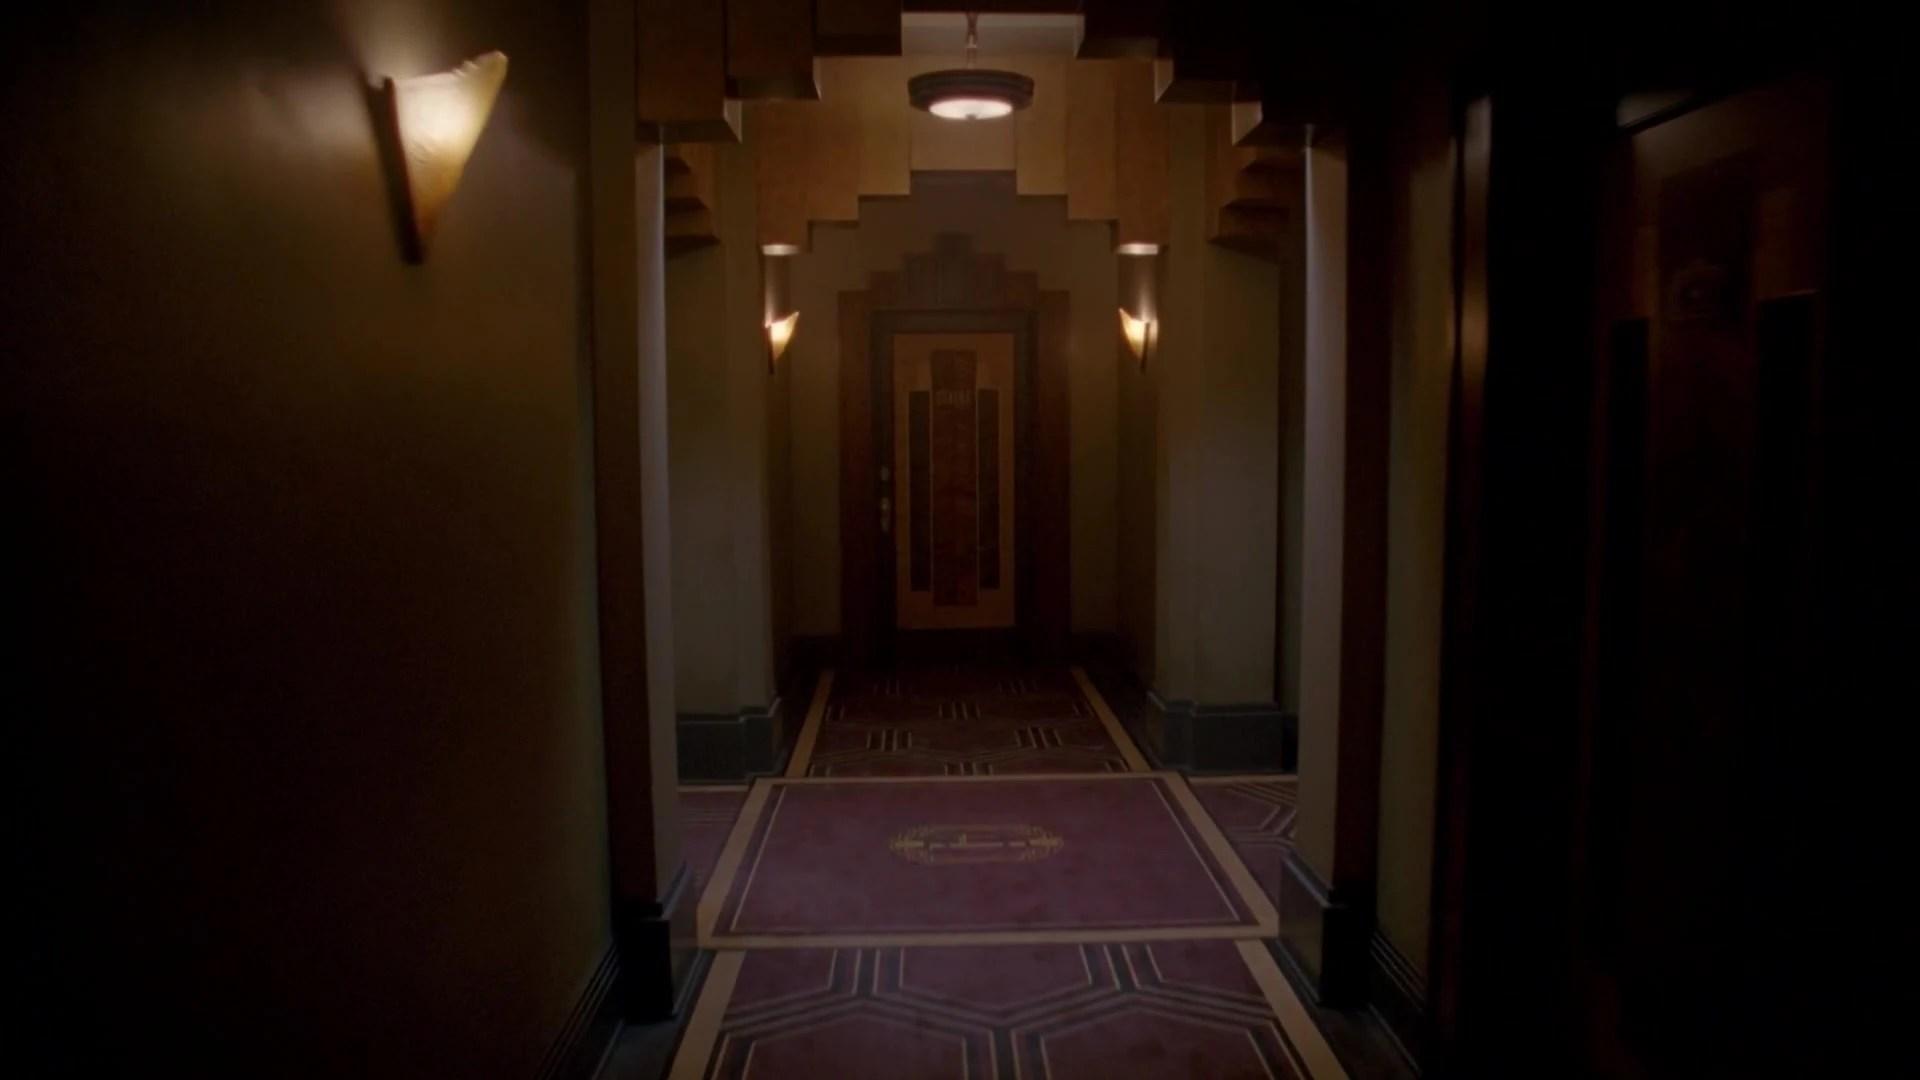 Hotel Cortez Hallway American Horror